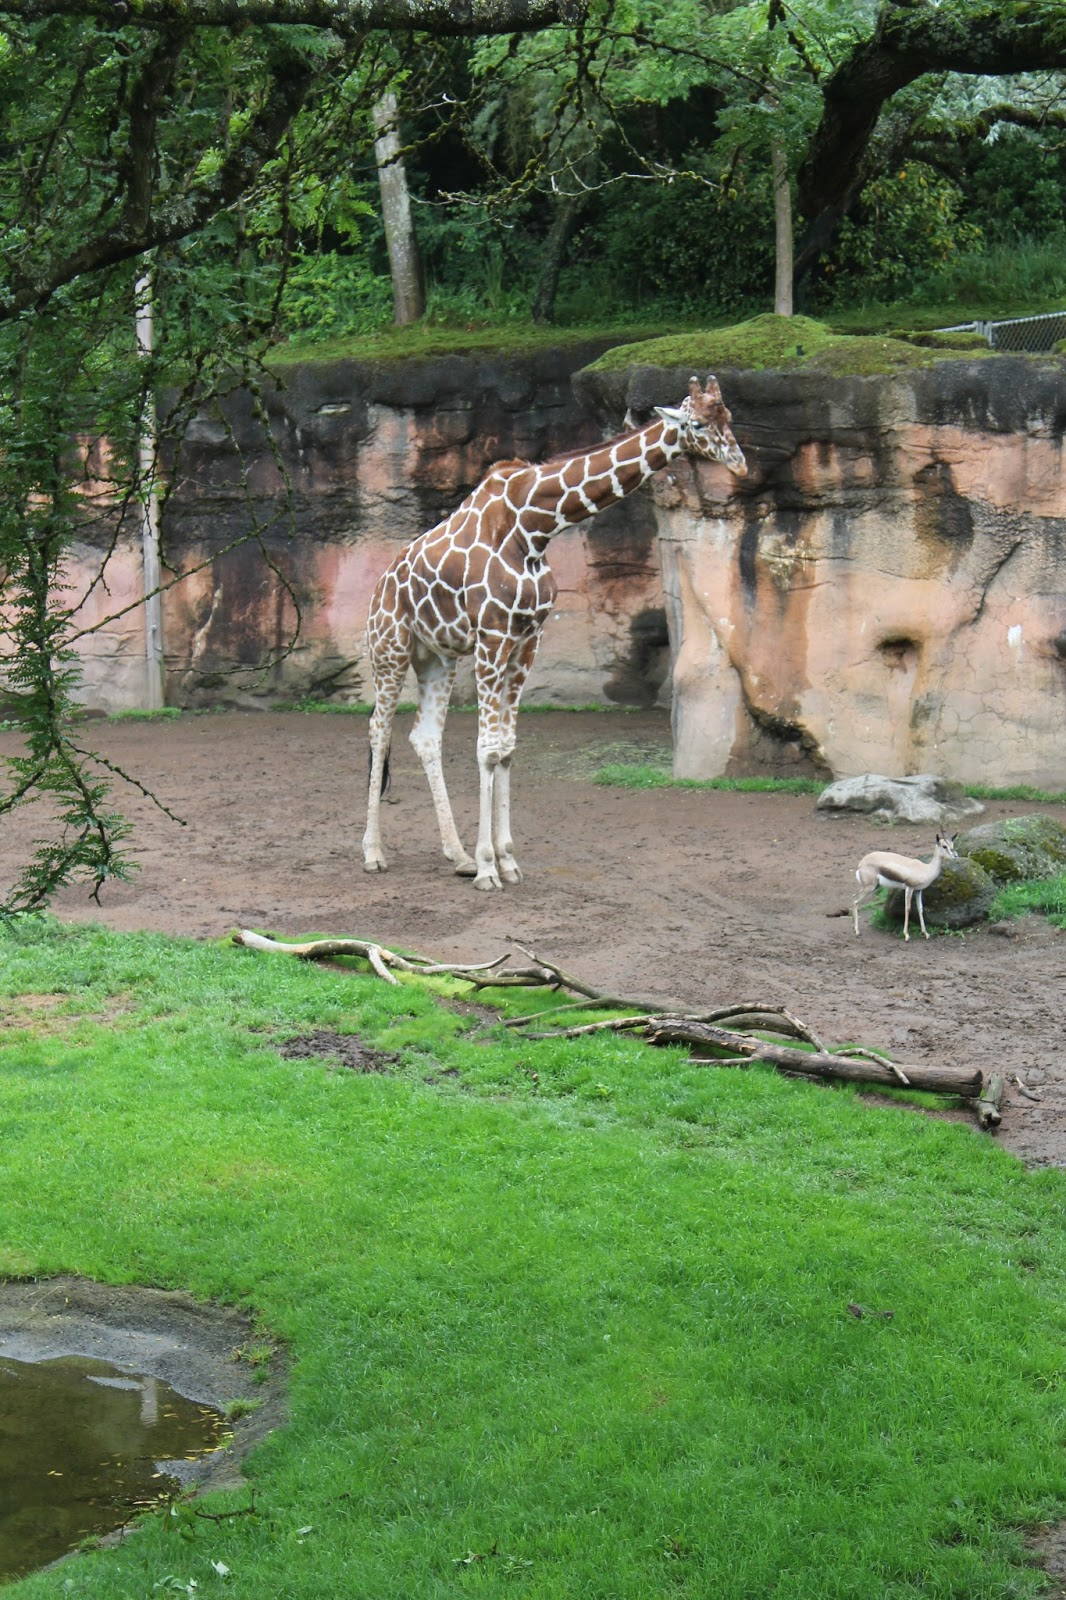 Oregon Zoo: The Cunningham Family: Oregon Zoo